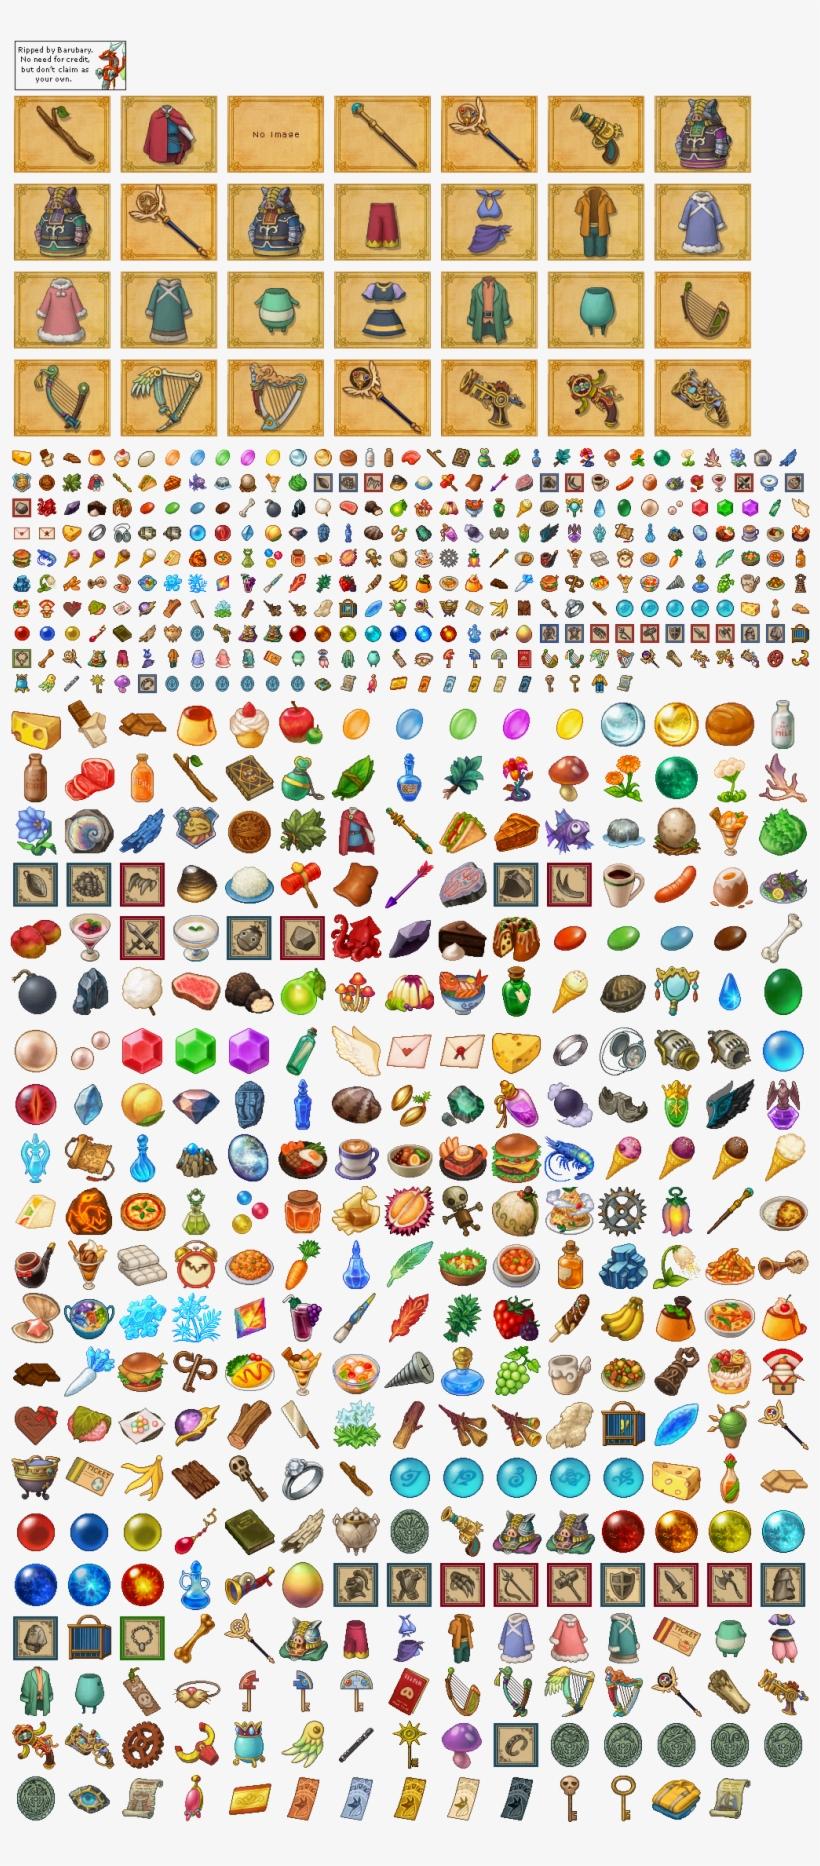 Click For Full Sized Image Item Icons - Ni No Kuni Pixel